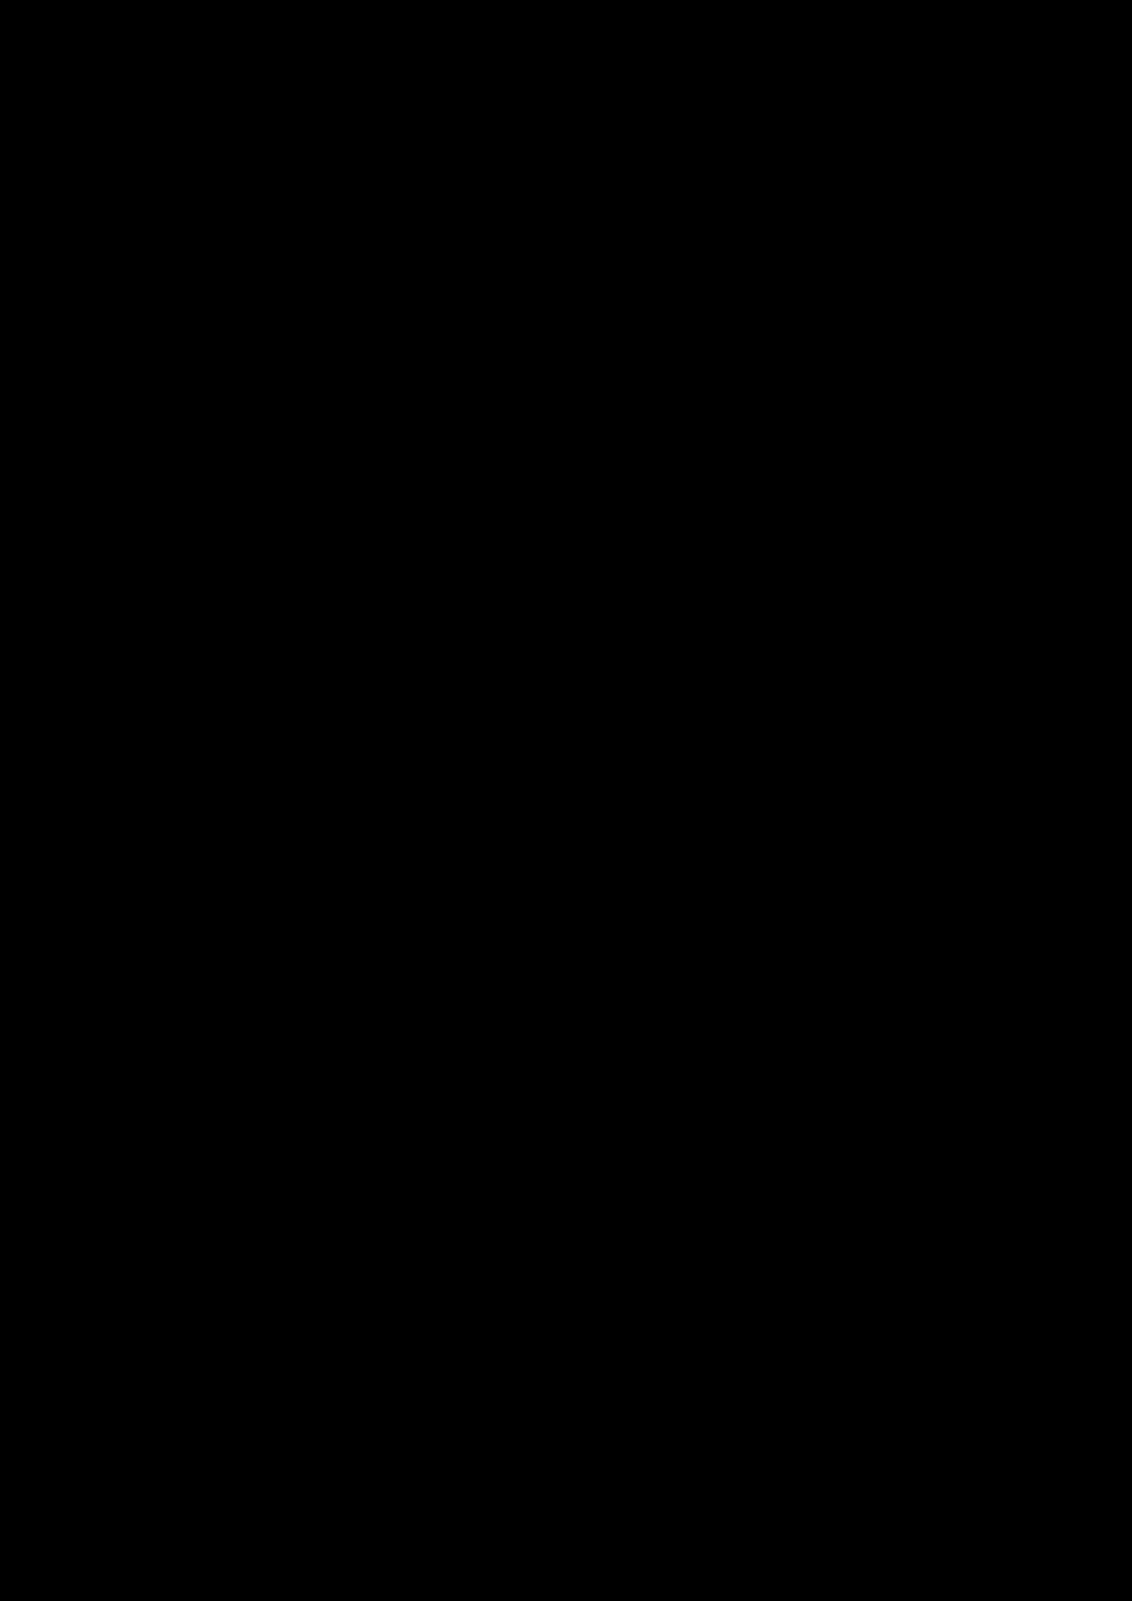 Ten lyubvi slide, Image 8